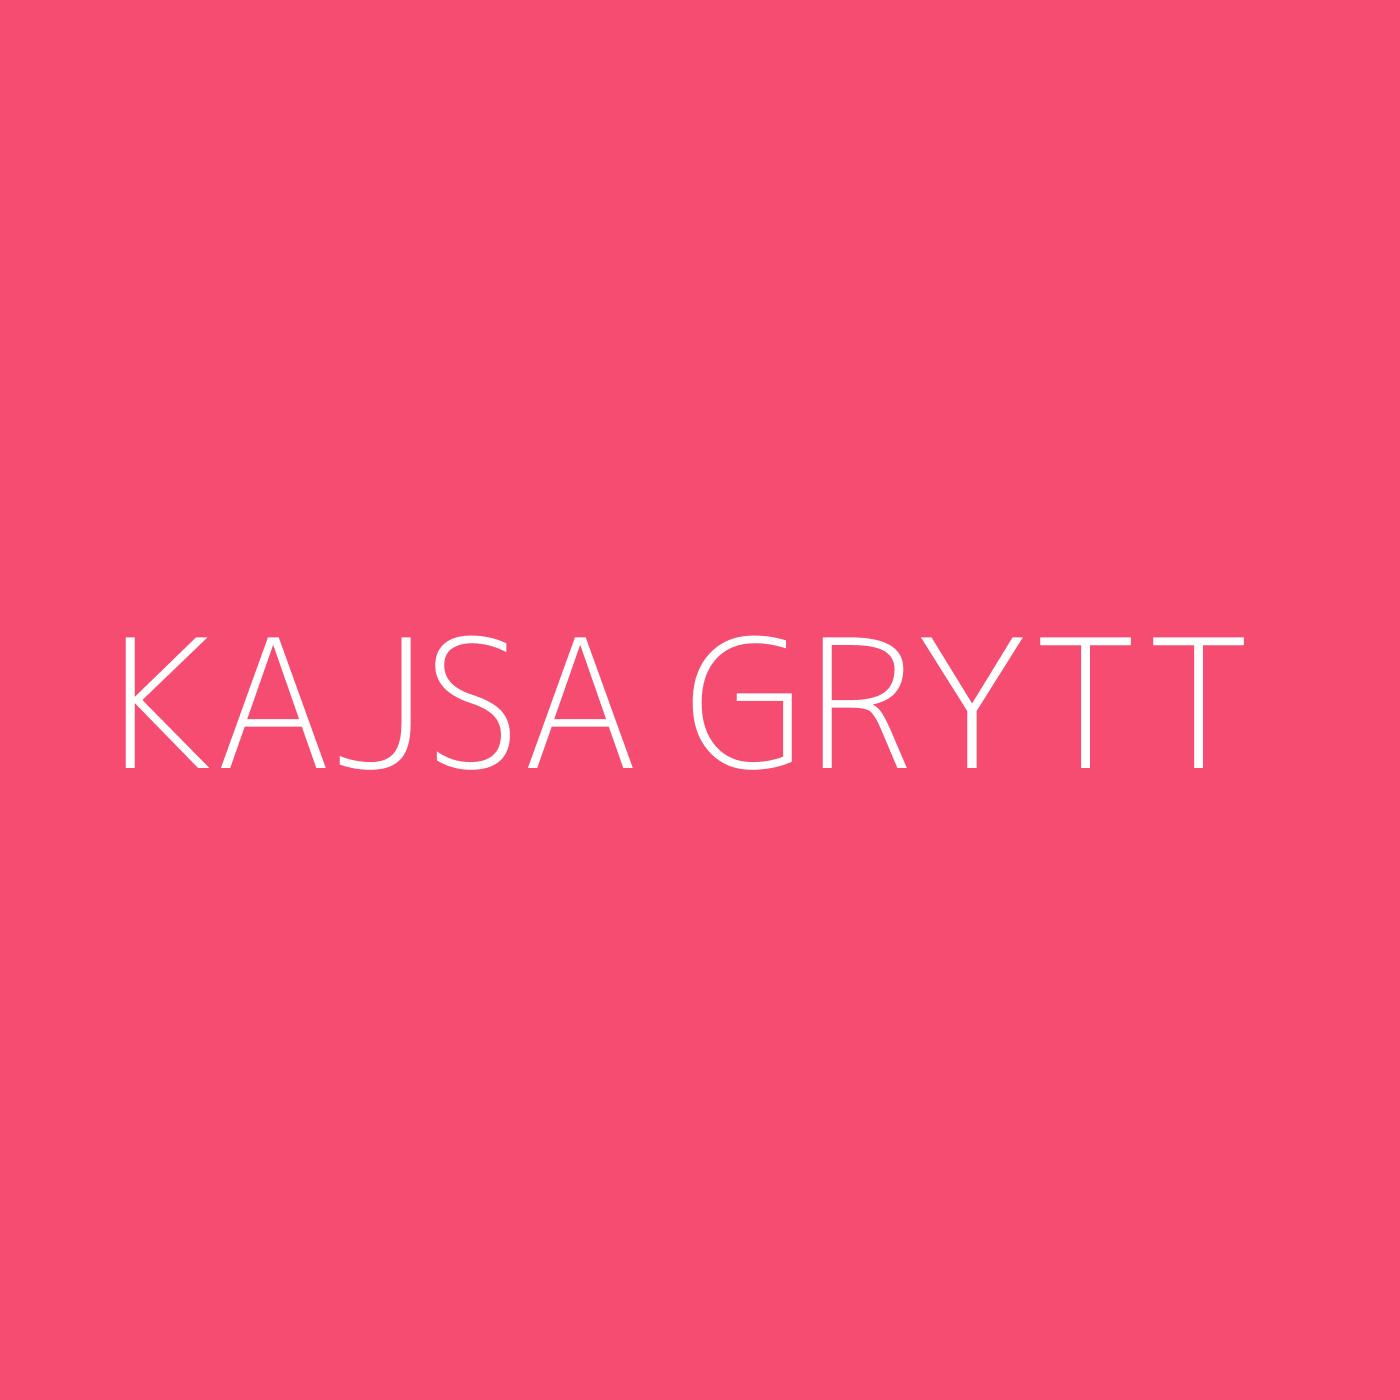 Kajsa Grytt Playlist Artwork